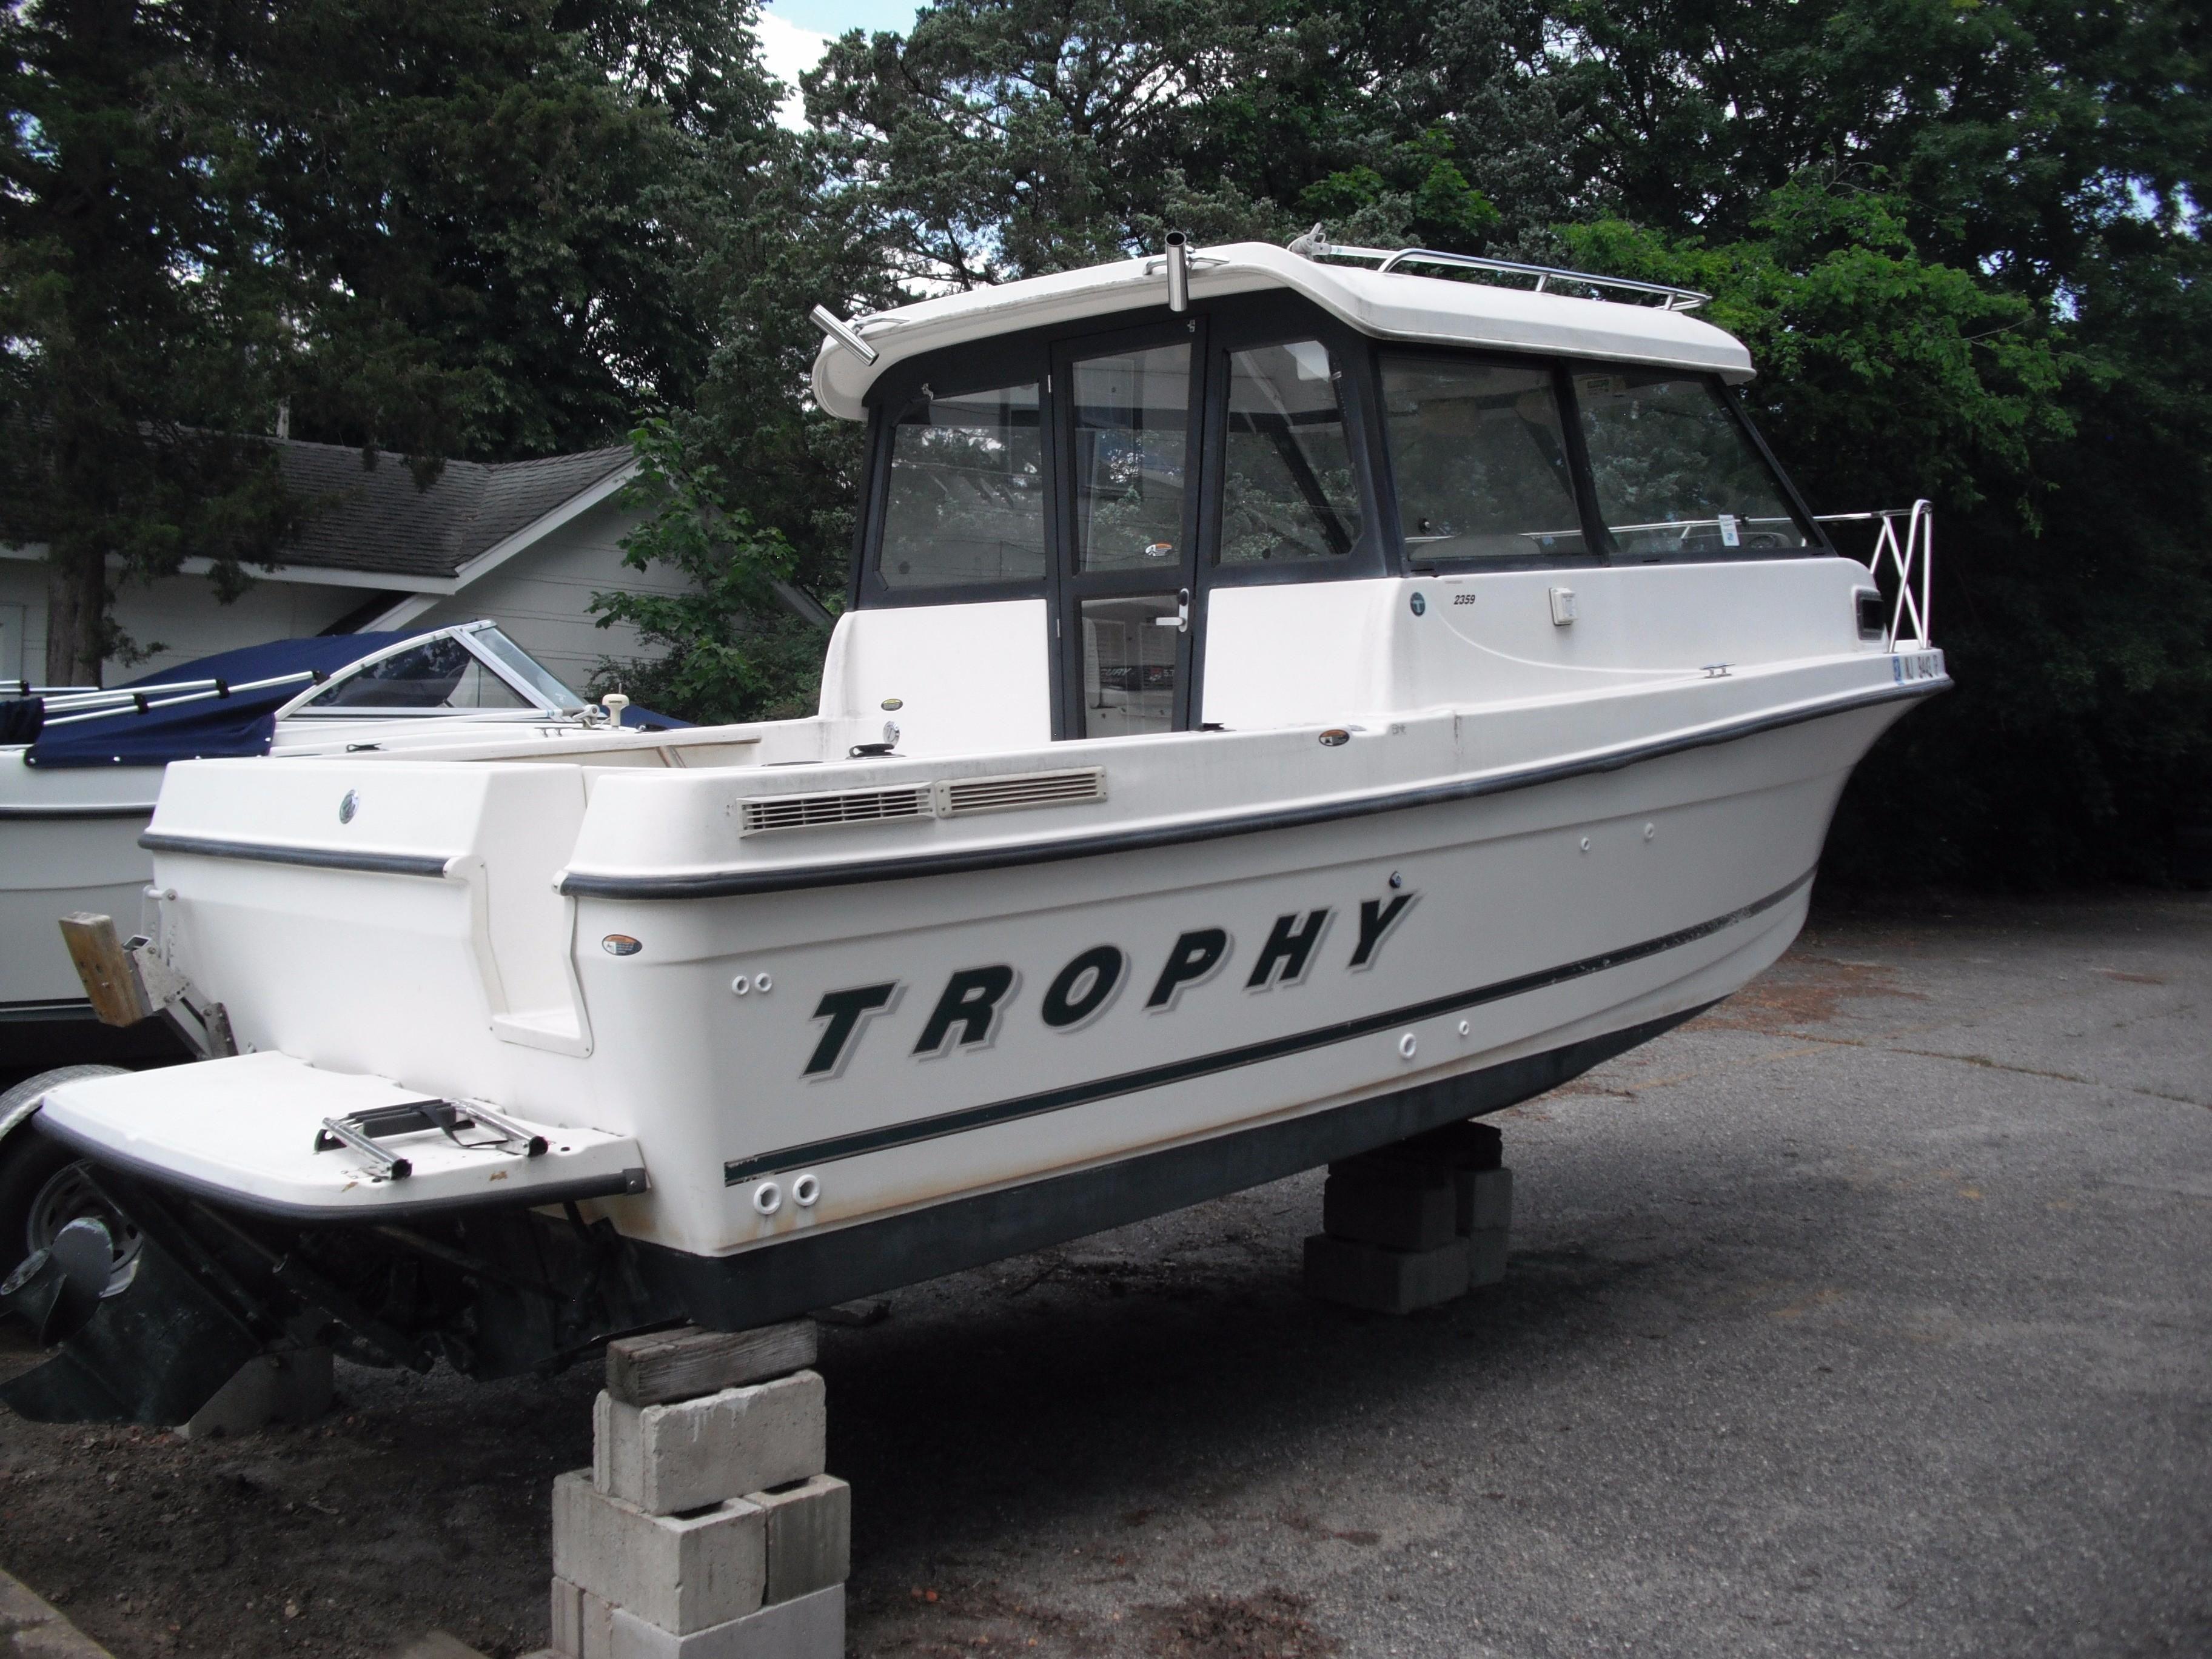 2001 Trophy 2359 Hardtop WA Power Boat For Sale - www.yachtworld.com